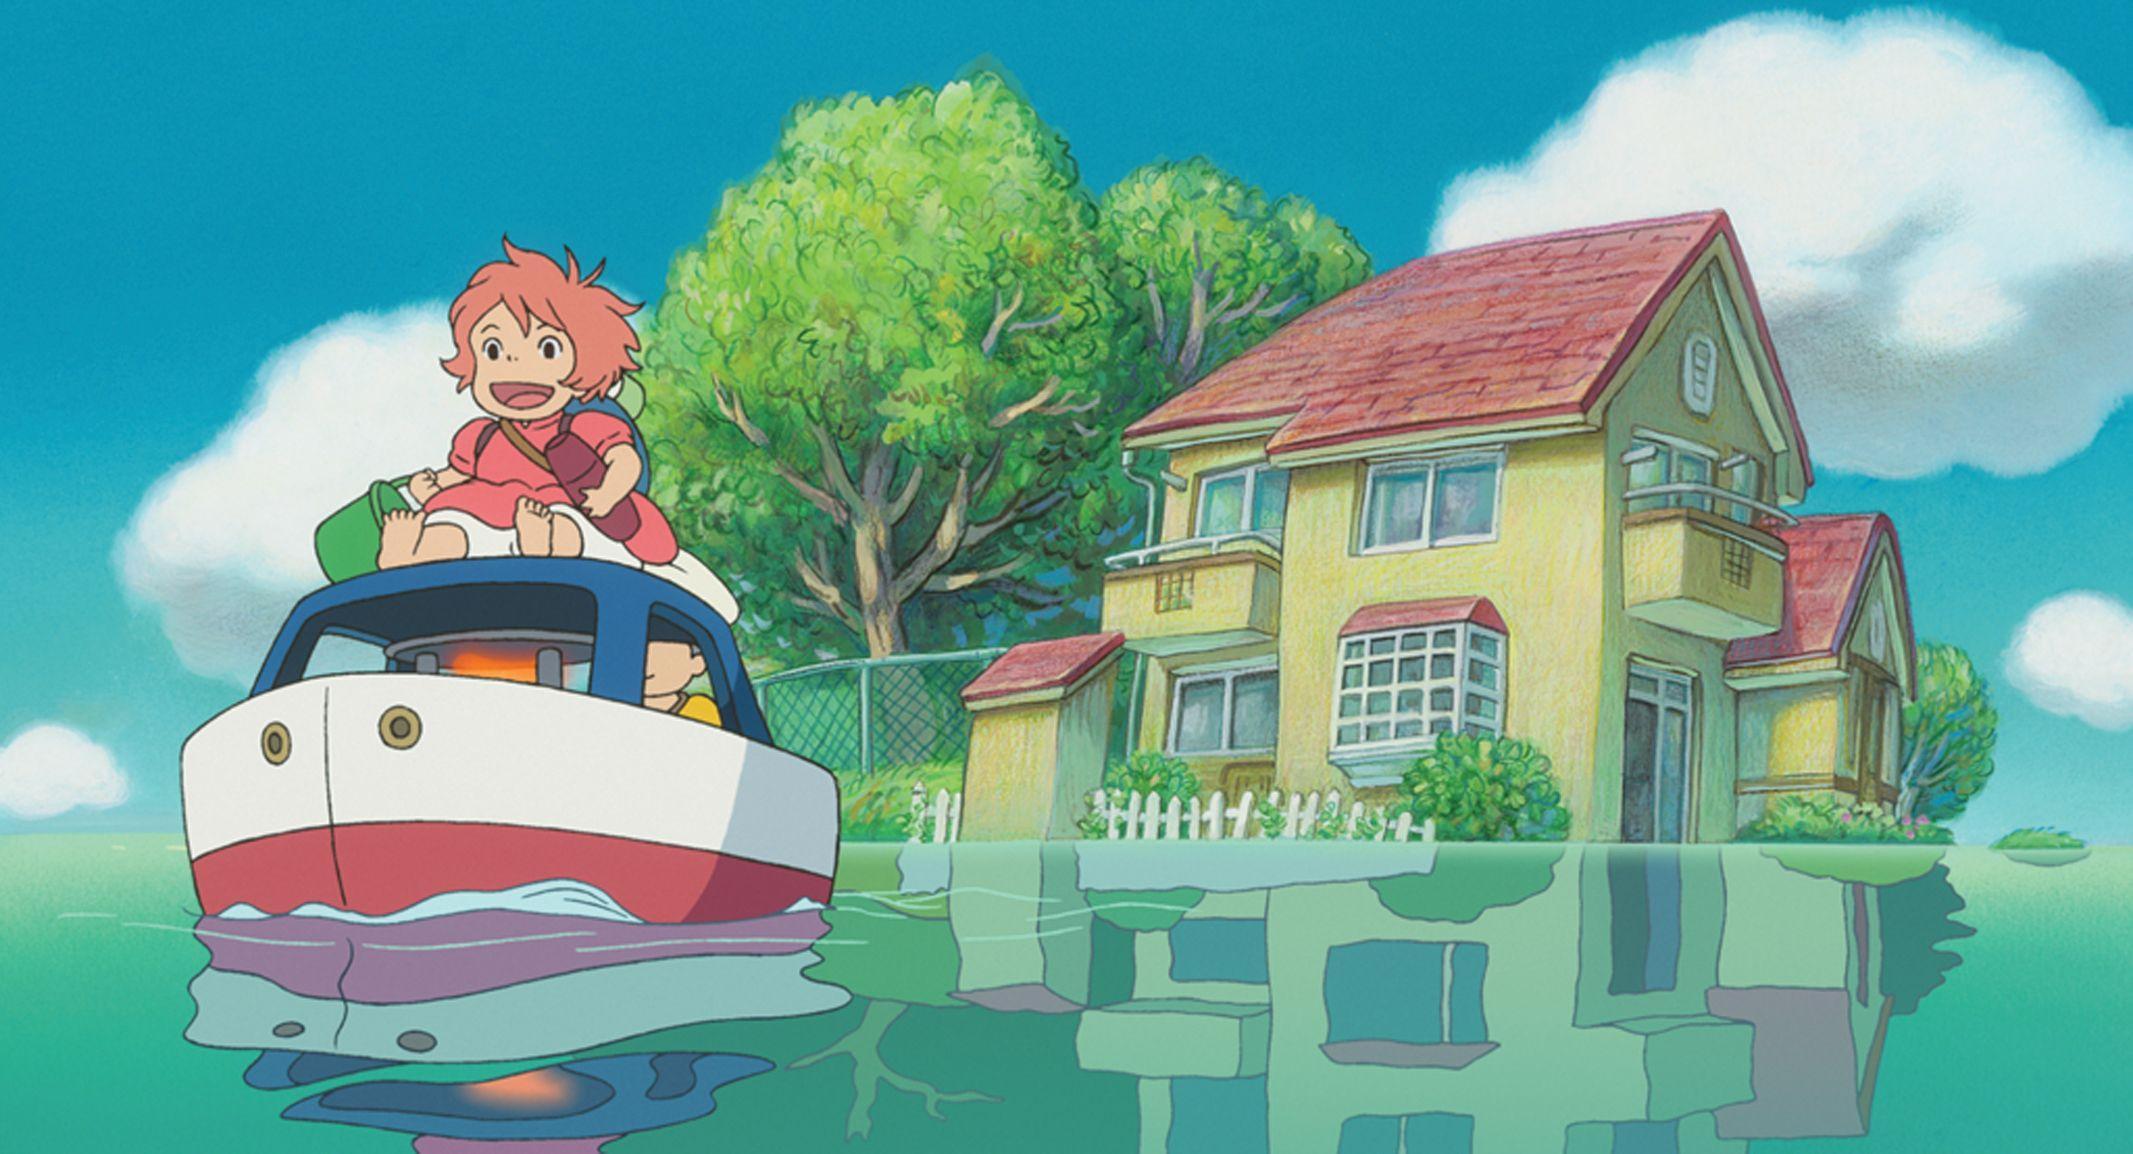 Ponyo Computer Wallpapers Desktop Backgrounds 2133x1154 Id 420284 Studio Ghibli Movies Ponyo Studio Ghibli